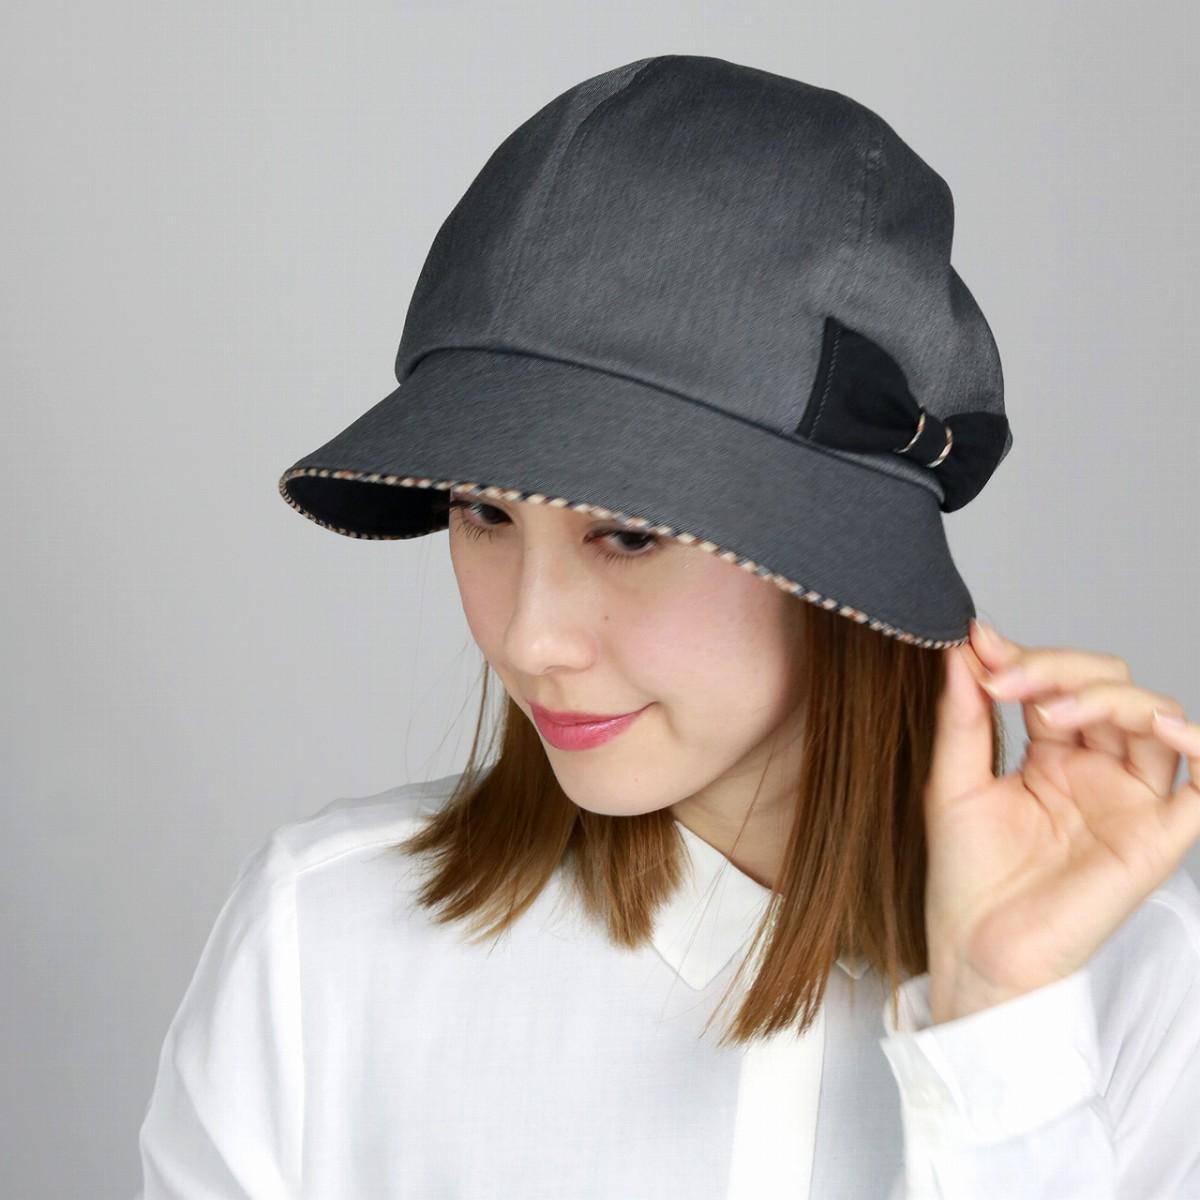 DAKS Dax kathcrocshe Hat ladies Ribbon tasteful women s autumn winter made  in Japan   grey 1f4ddd6b367